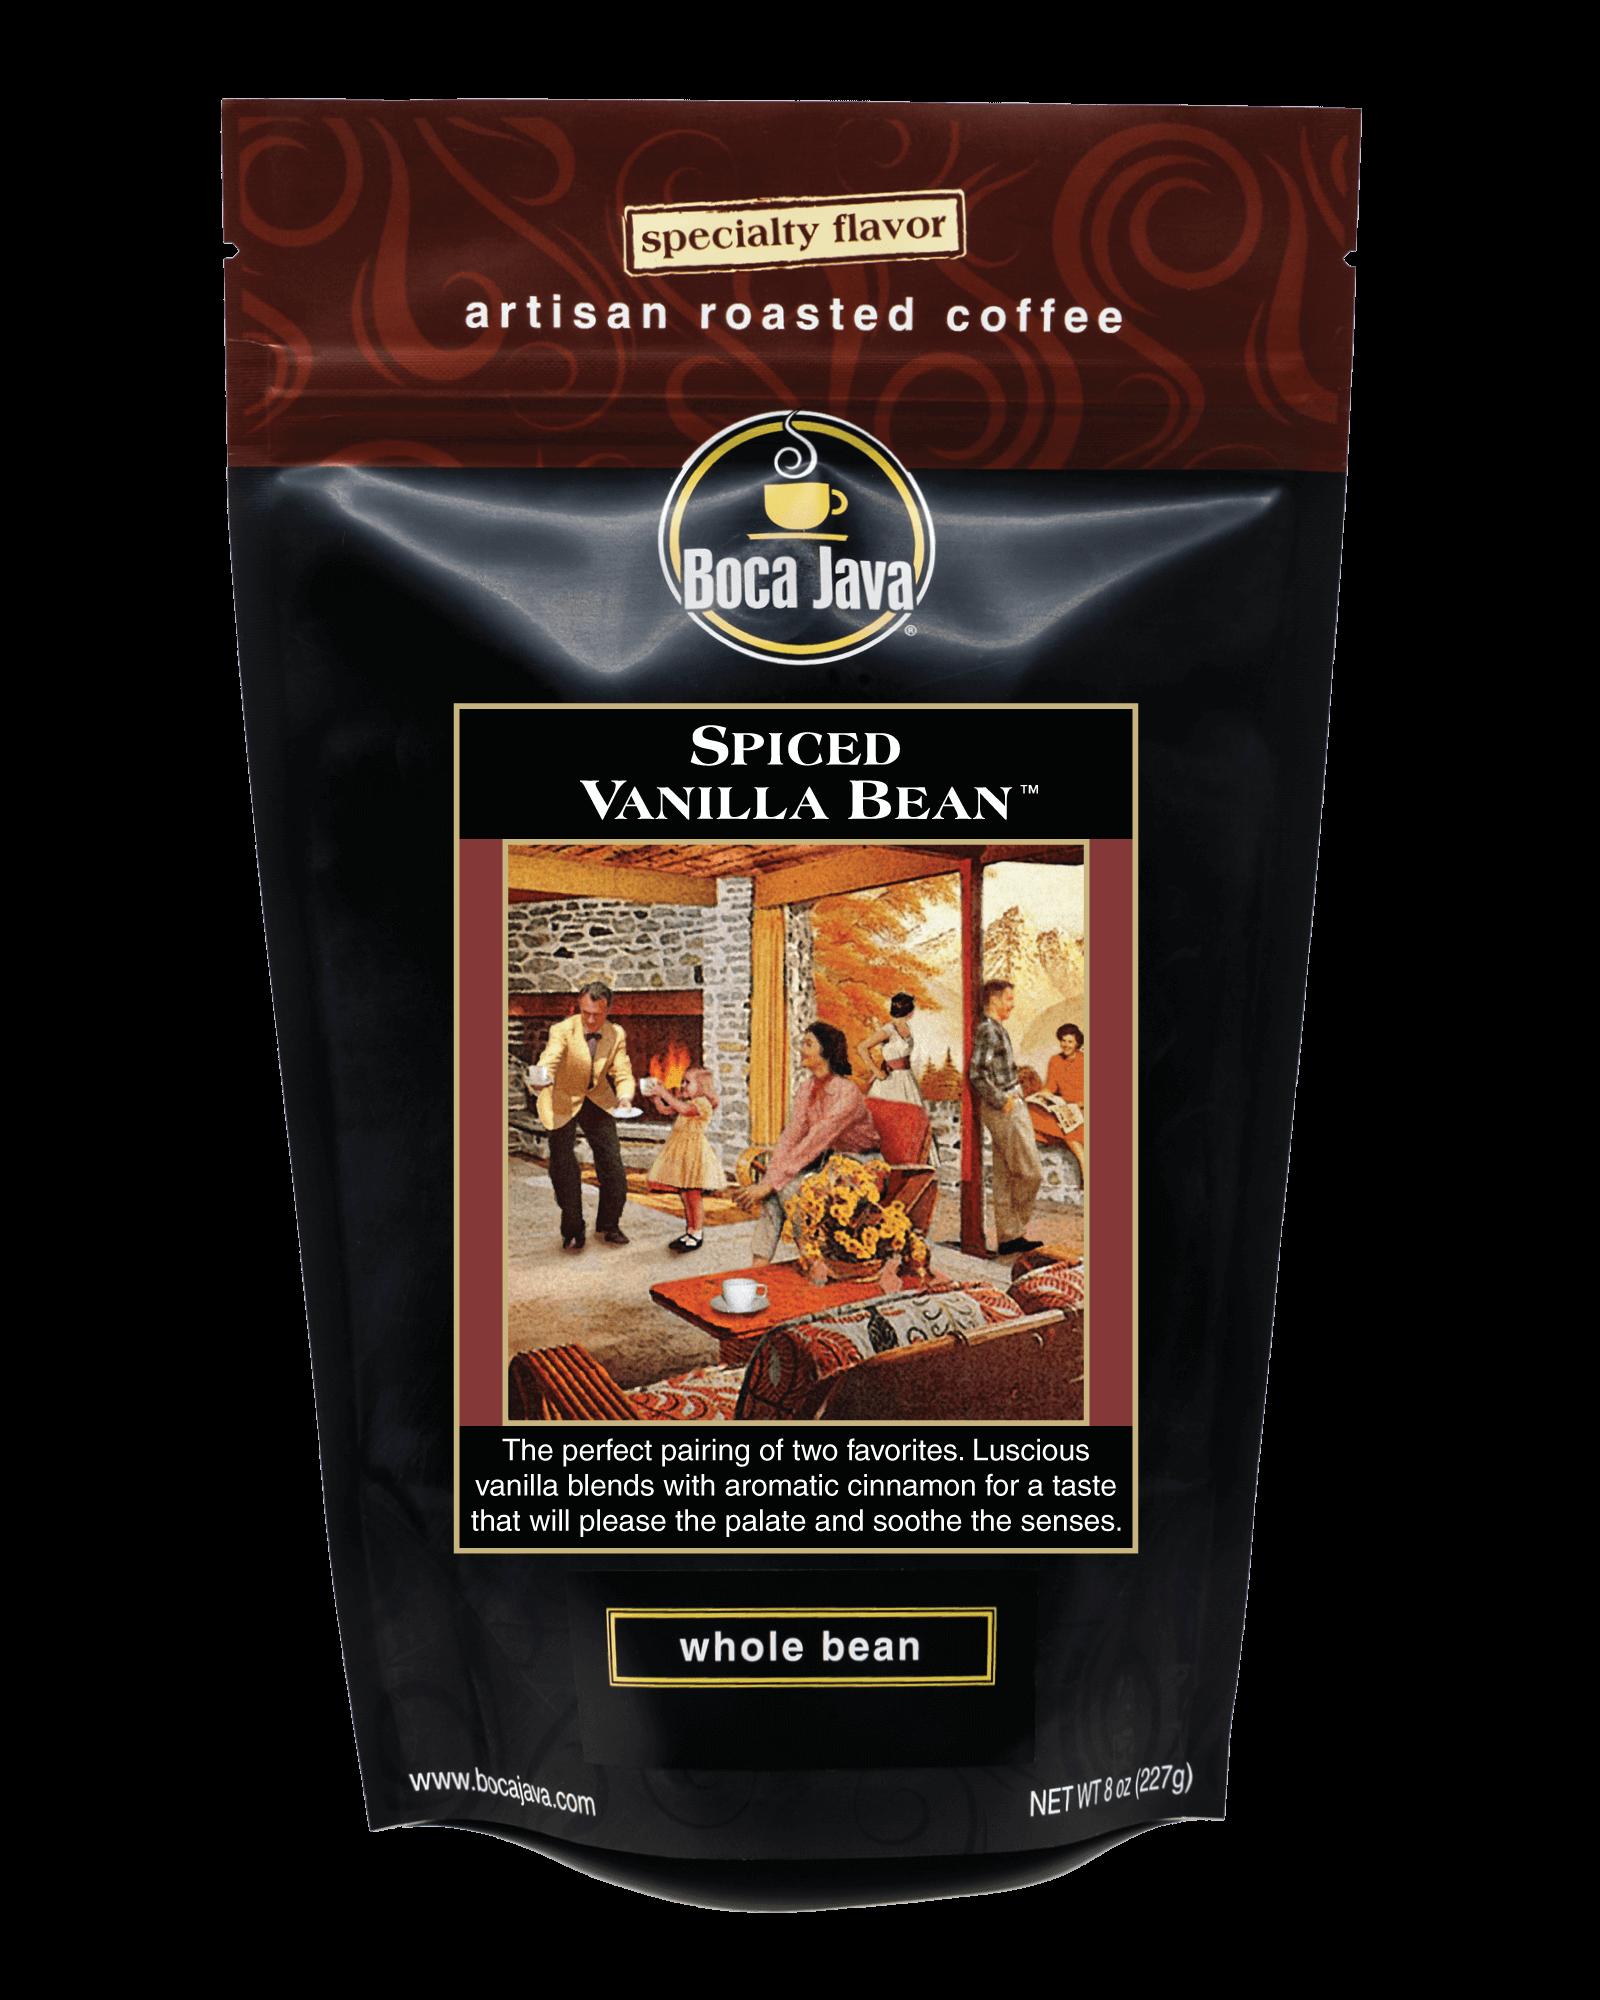 Spiced Vanilla Bean